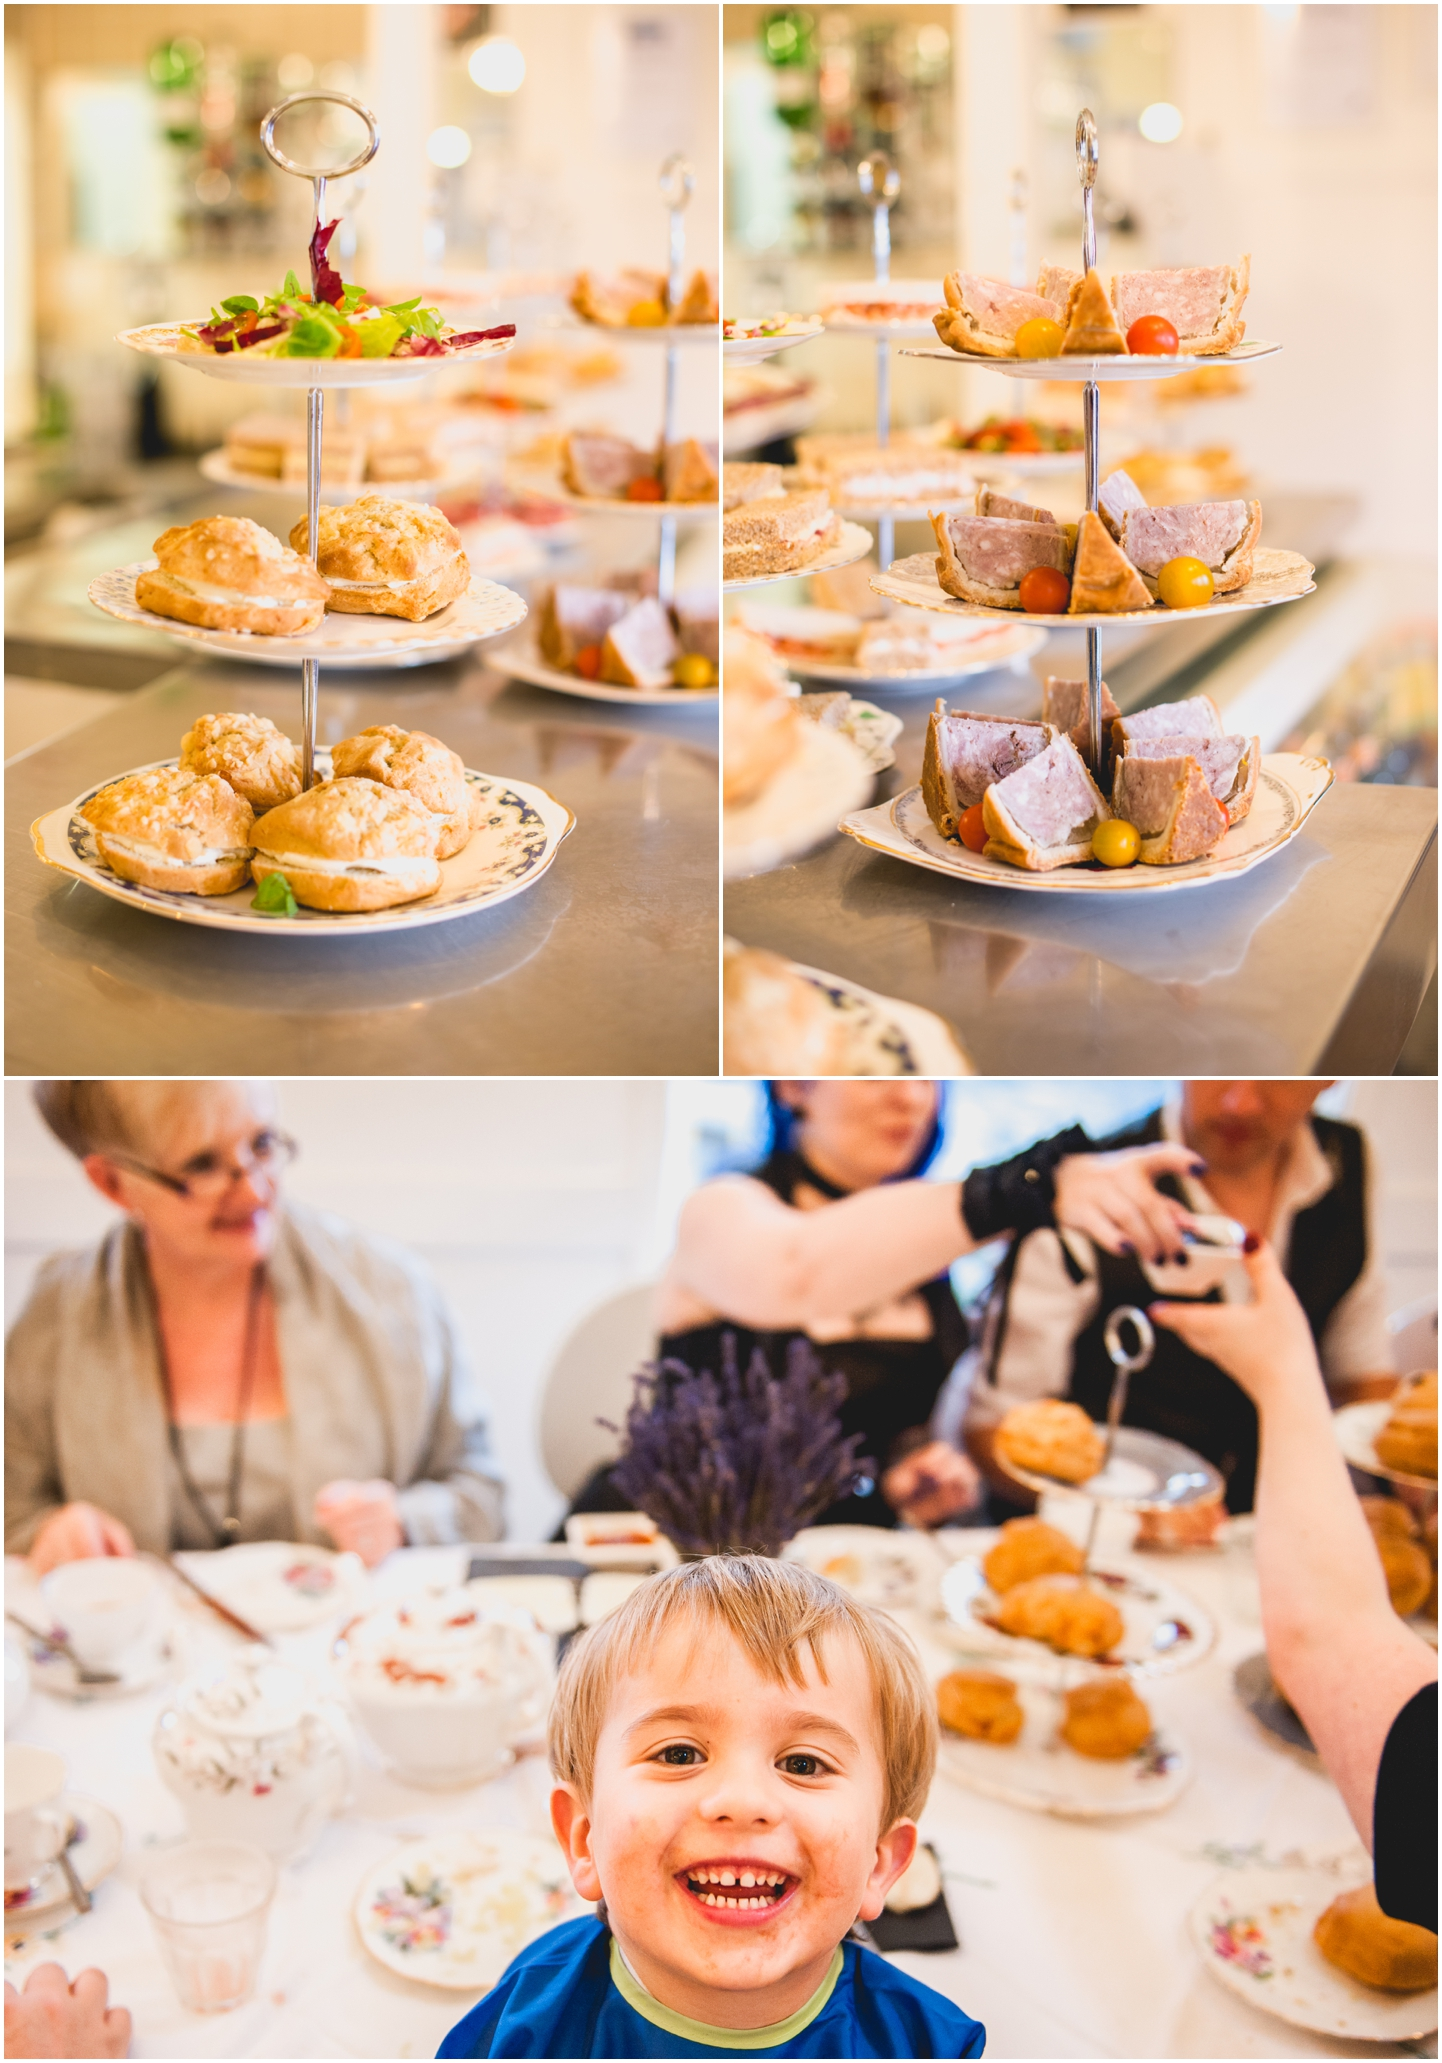 Bond Company Wedding, Digbeth, Lisa Carpenter Photography, Birmingham, goth wedding, alternative wedding, photos, afternoon tea